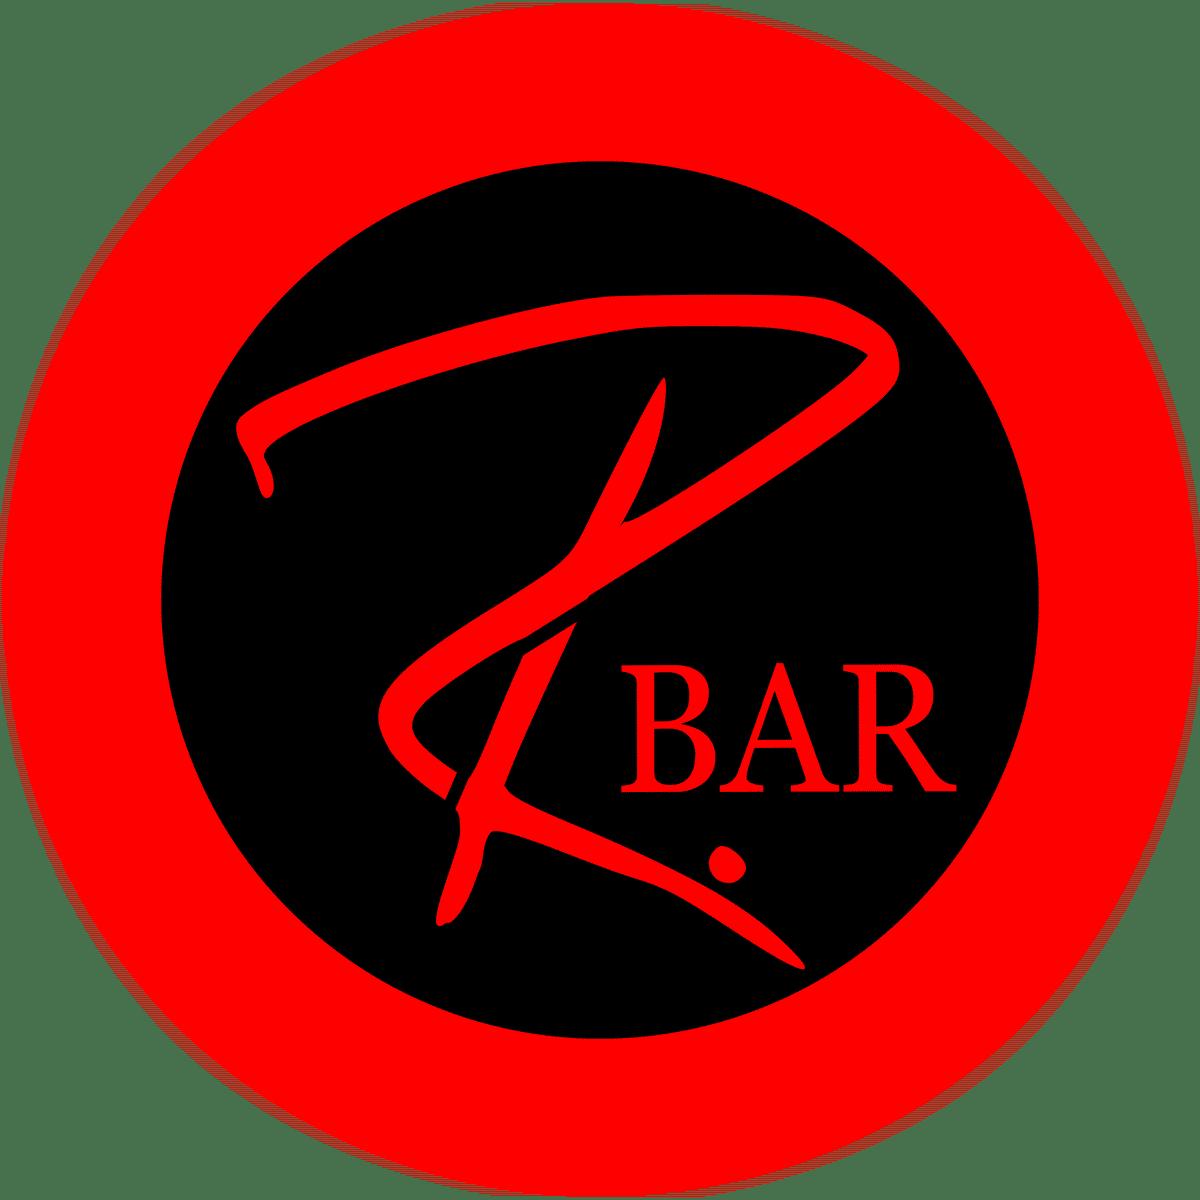 r bar logo